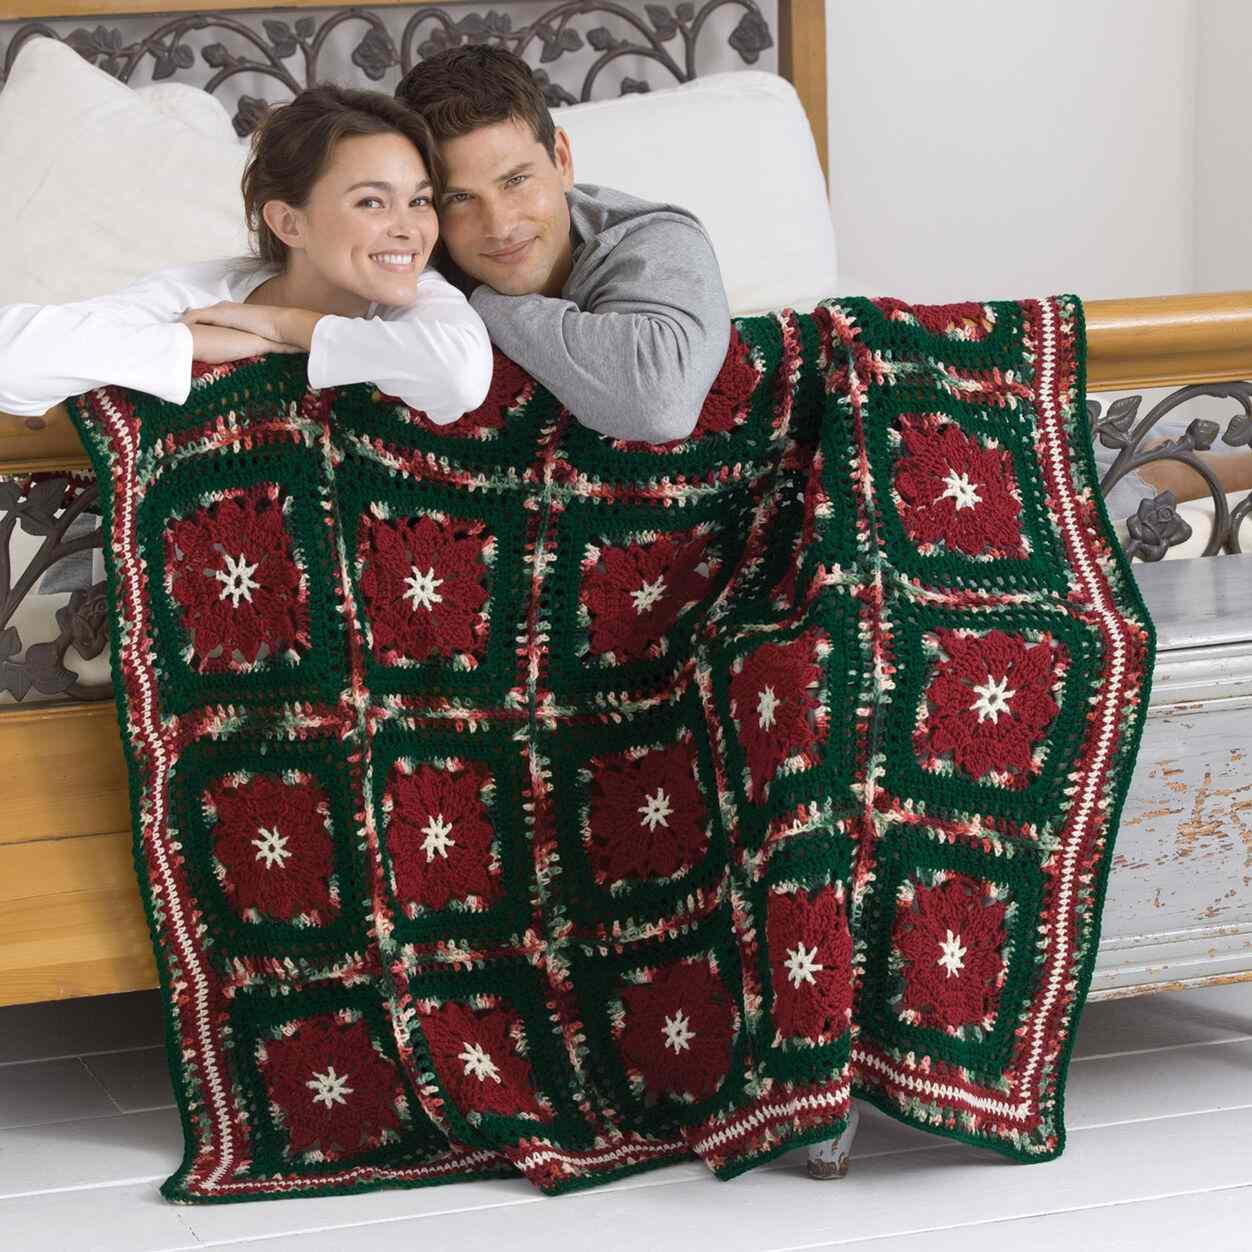 Poinsettia Throw Crochet Pattern